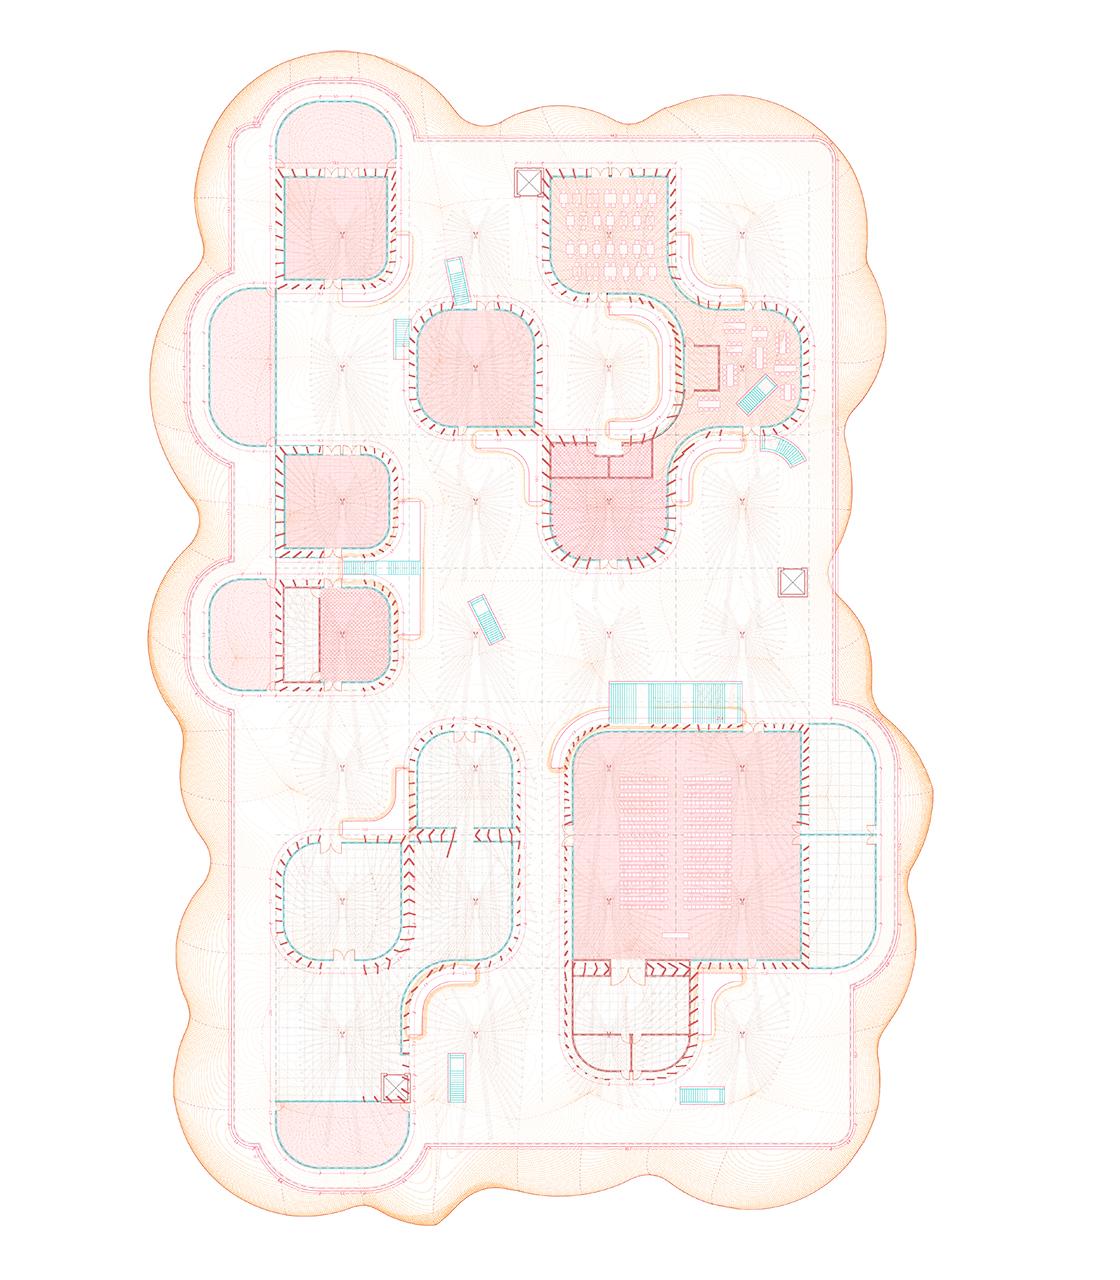 Guggenheim plan 1f